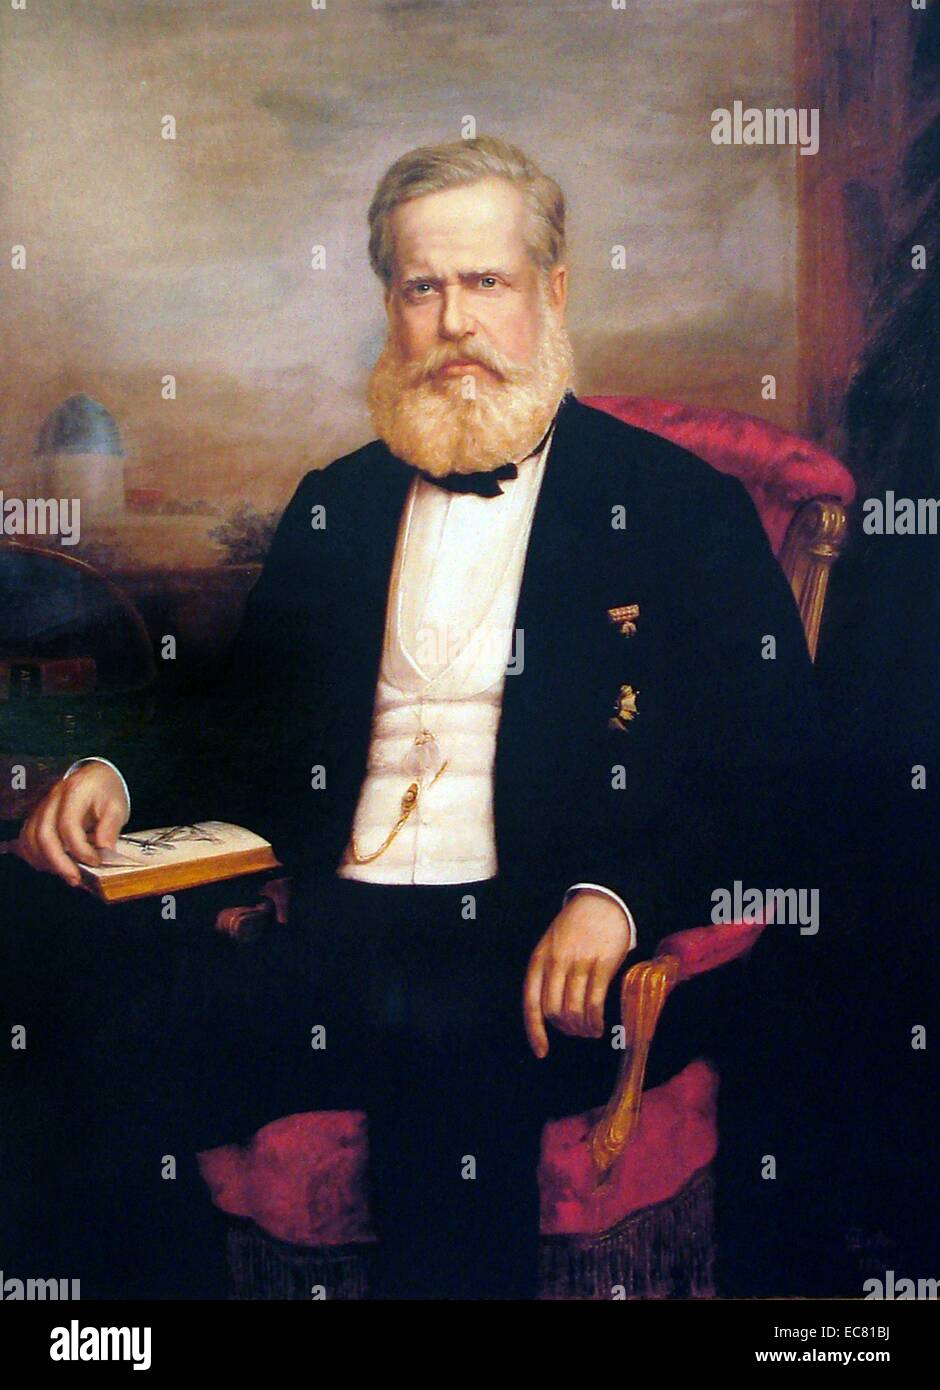 Pedro II of Brazil - Stock Image